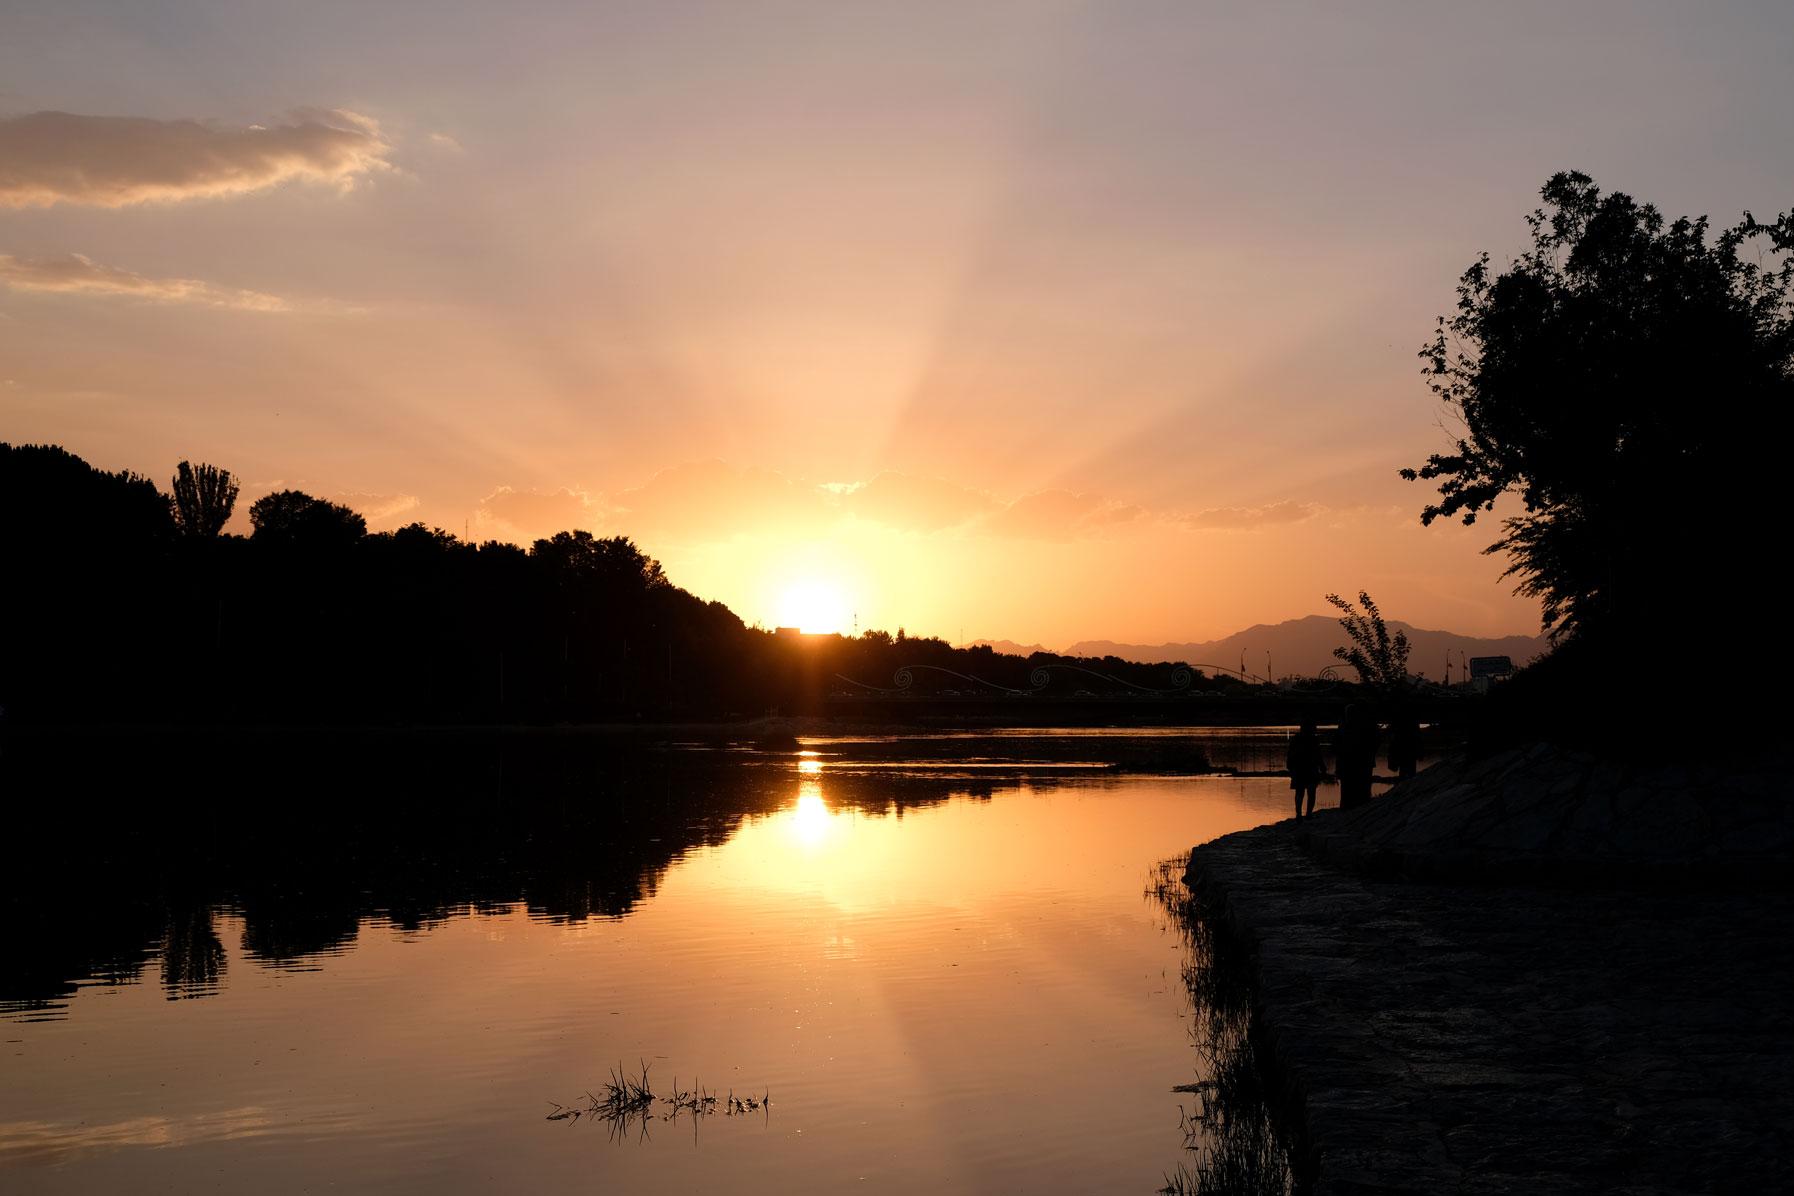 Sonnenuntergang über dem Zayandeh-Fluss